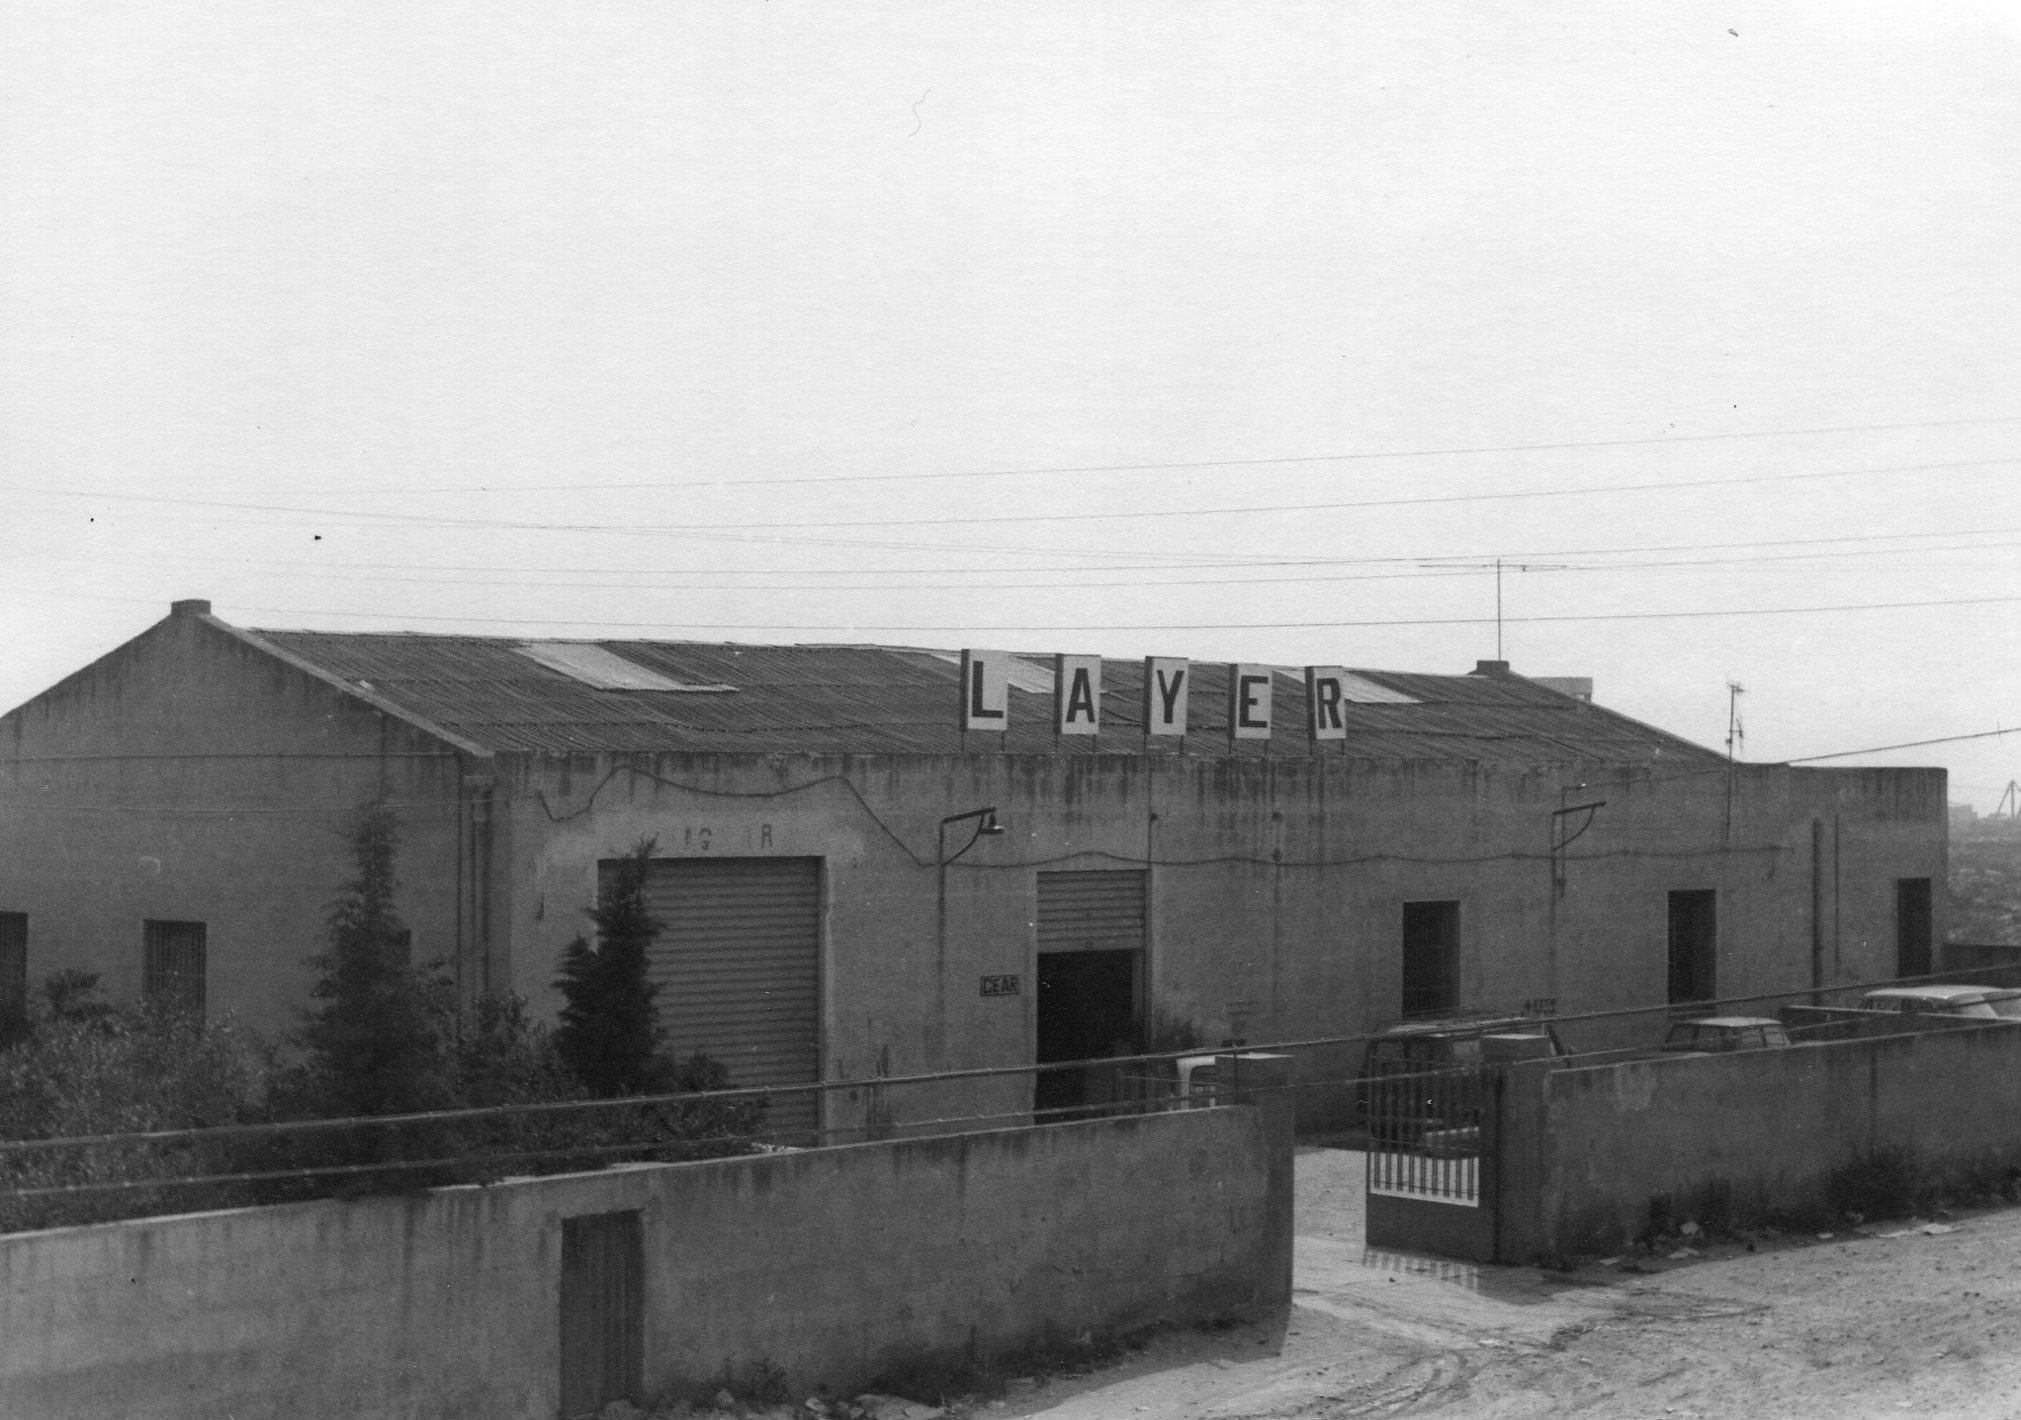 LAYER ELECTRONICS